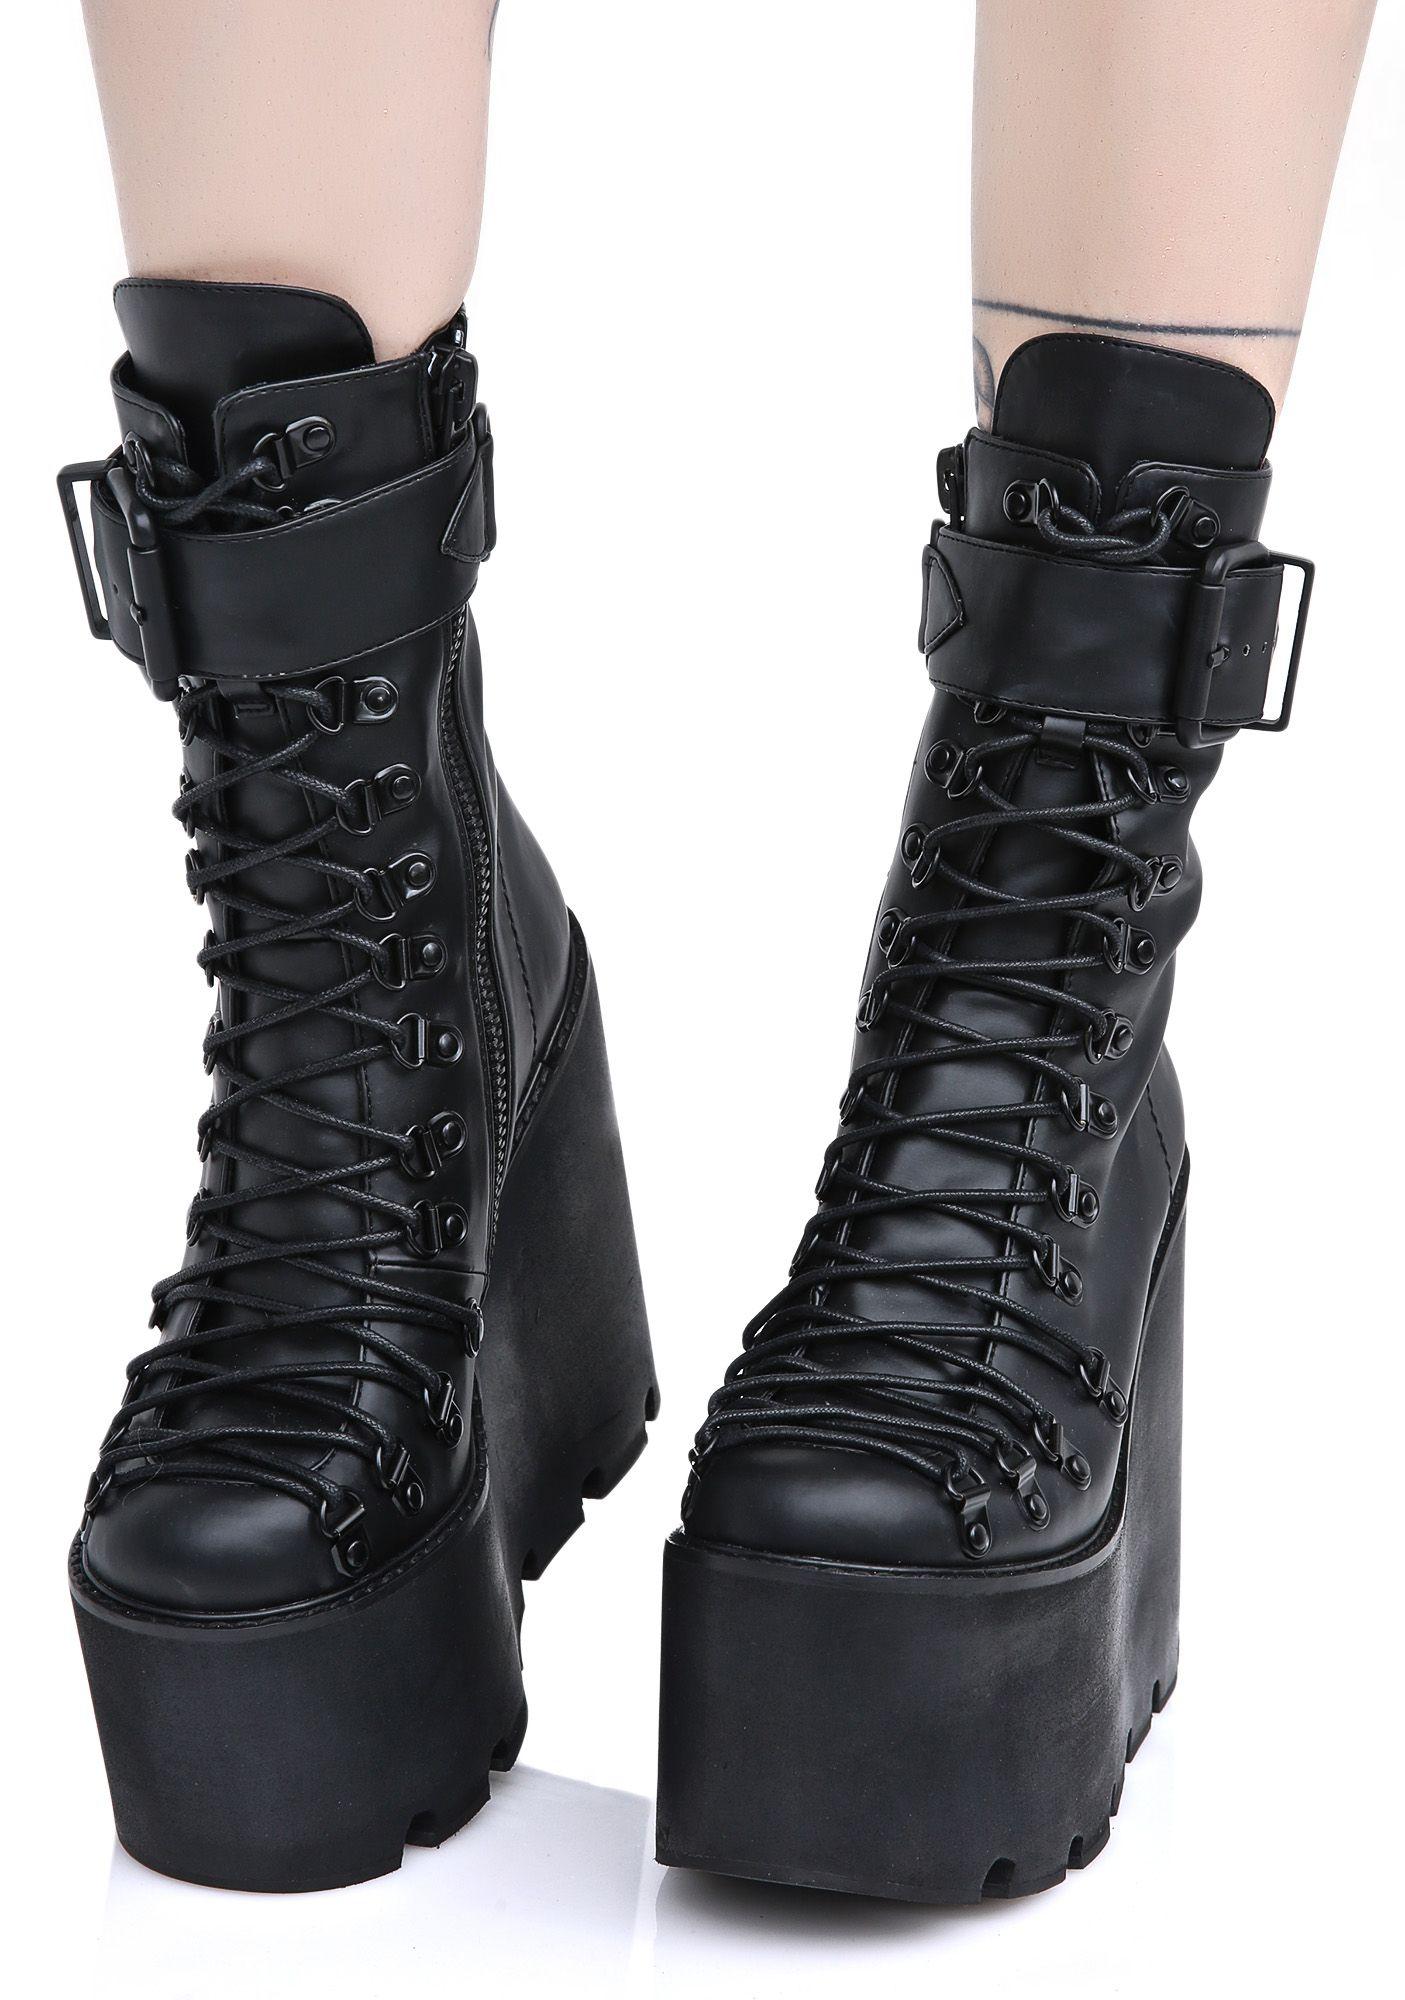 0f7d889d5fba83 Current Mood Traitor Boots  gothboots Dark Fashion